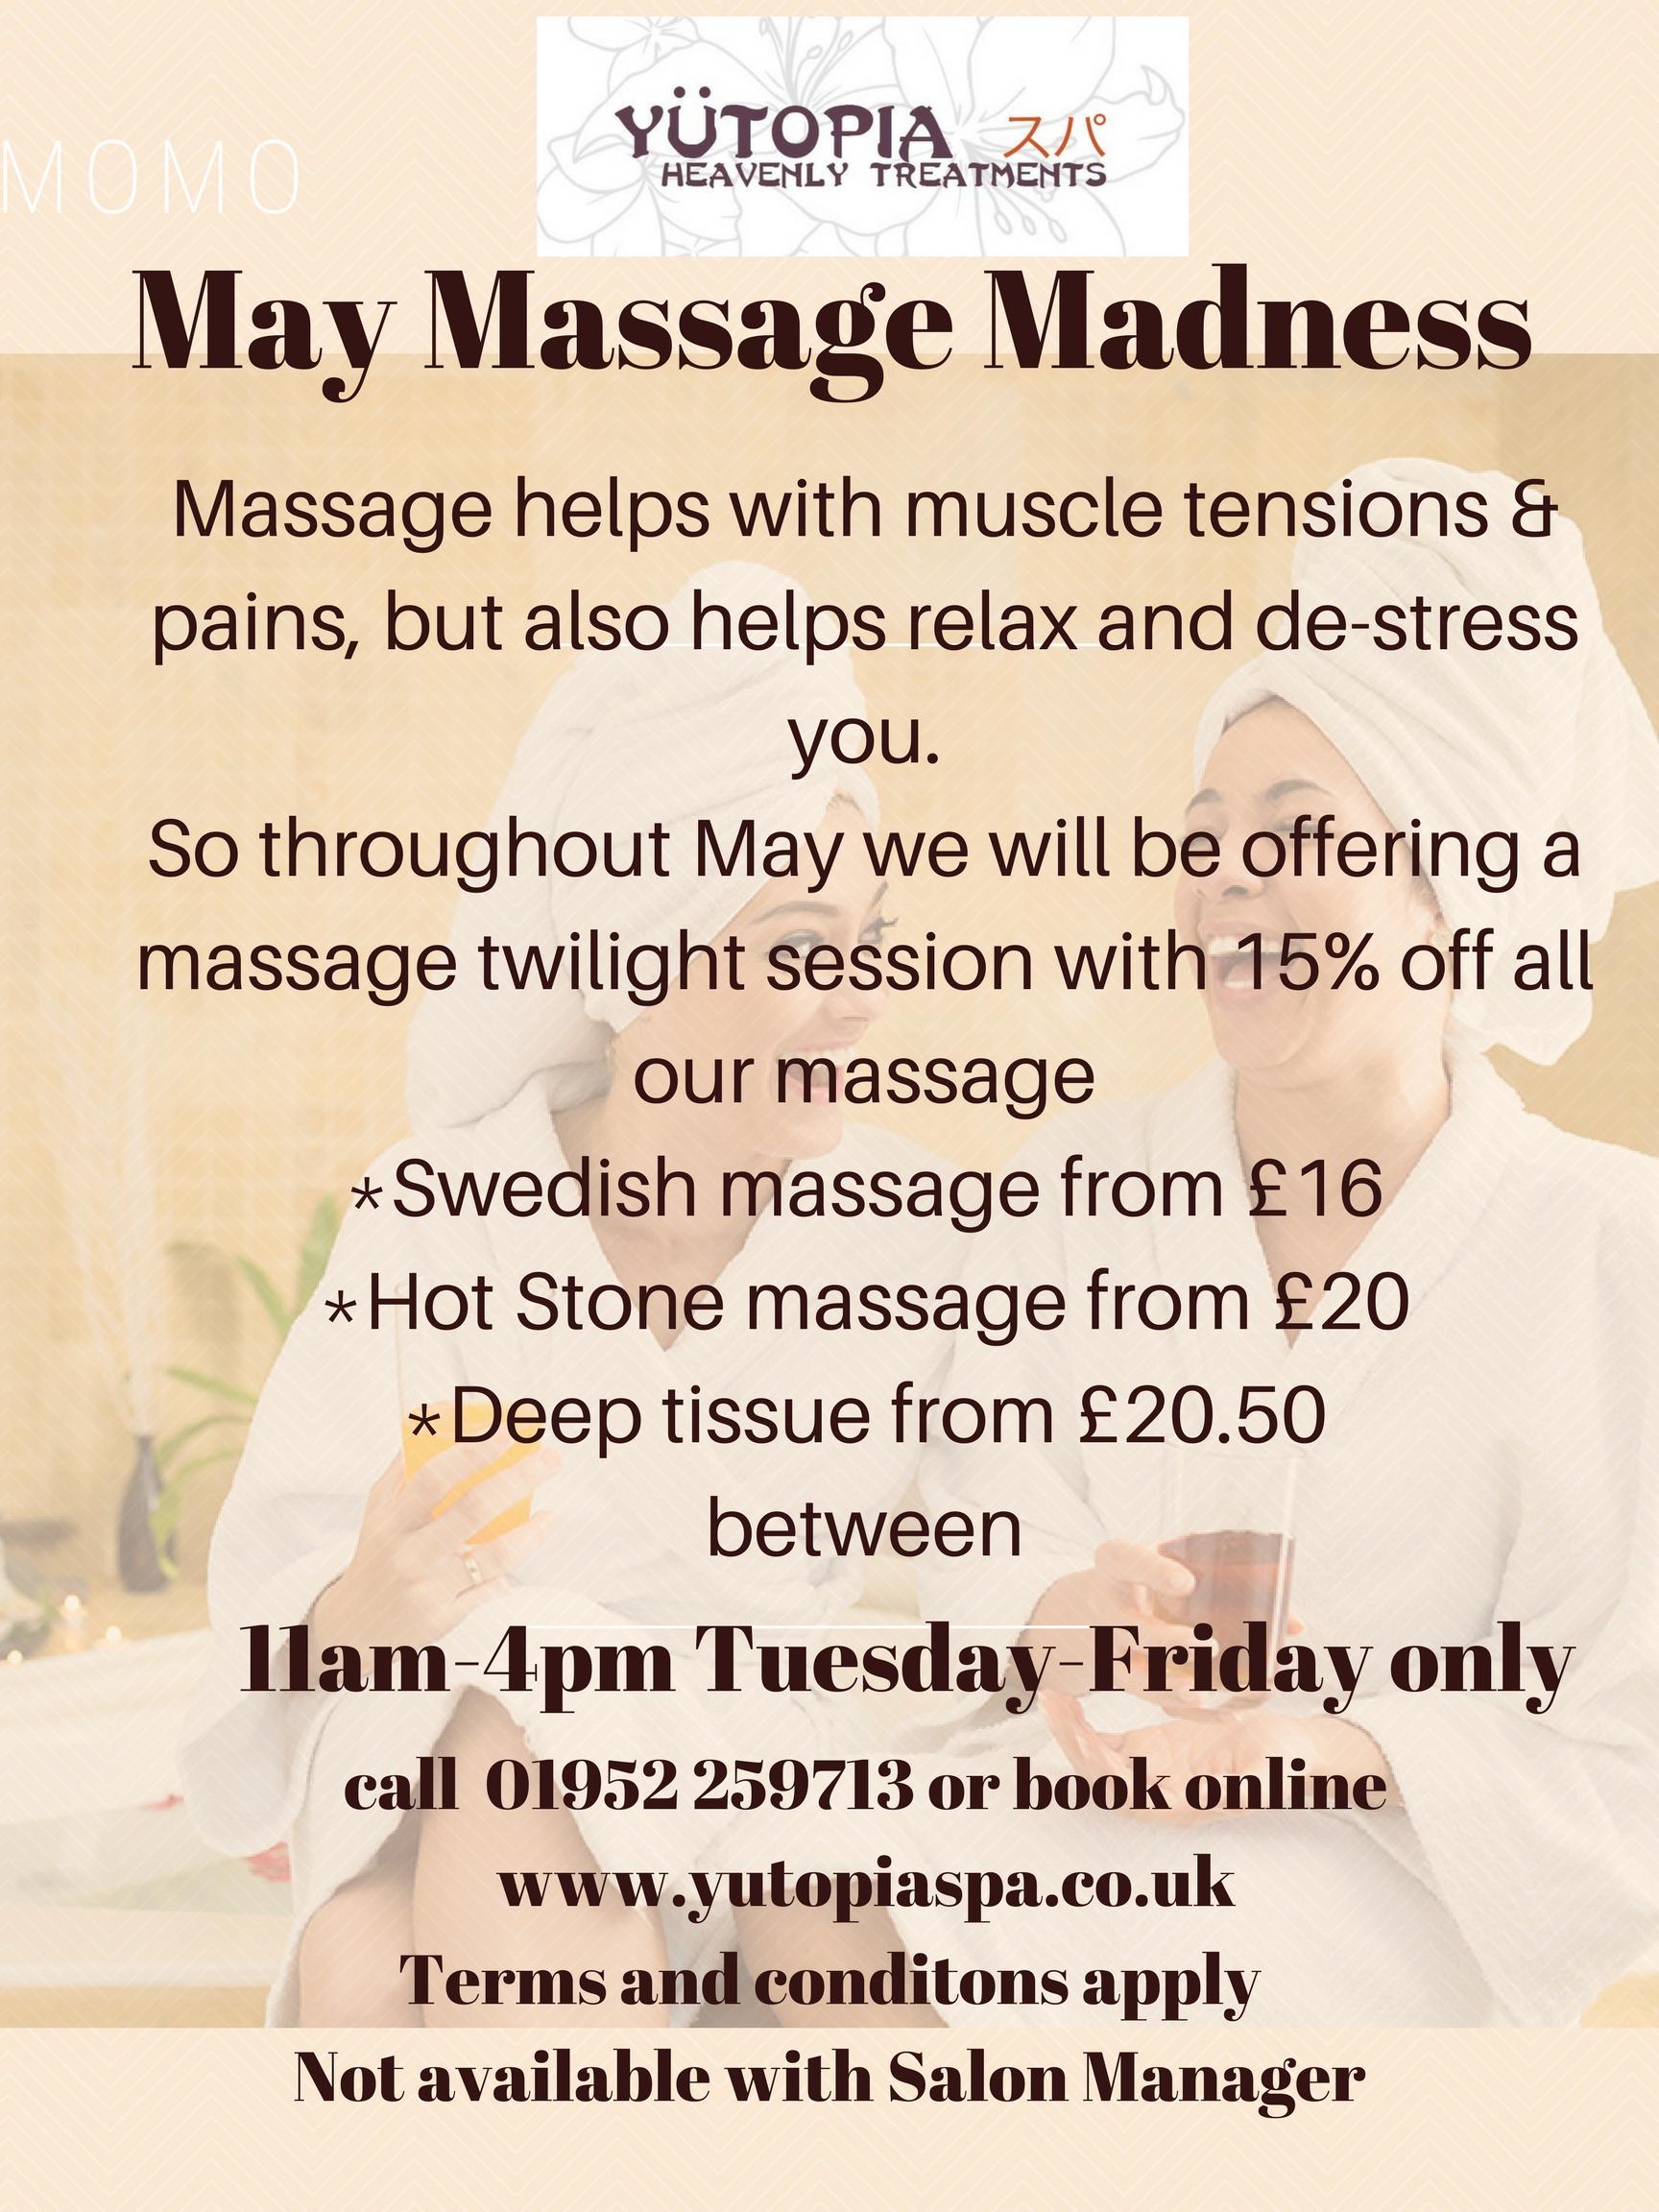 Massag madness(1)